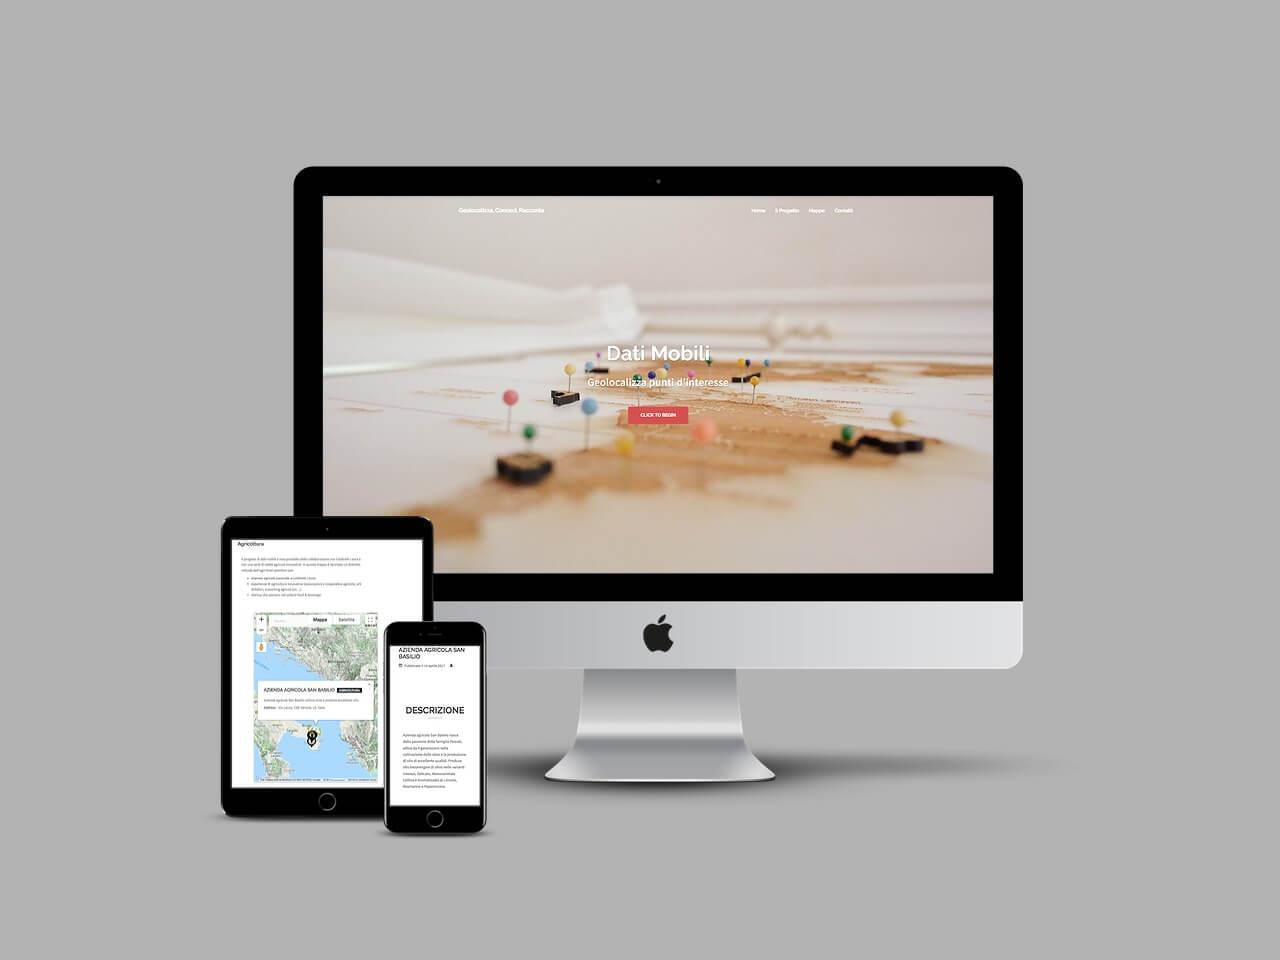 Dati Mobili – Caratteri Mobili